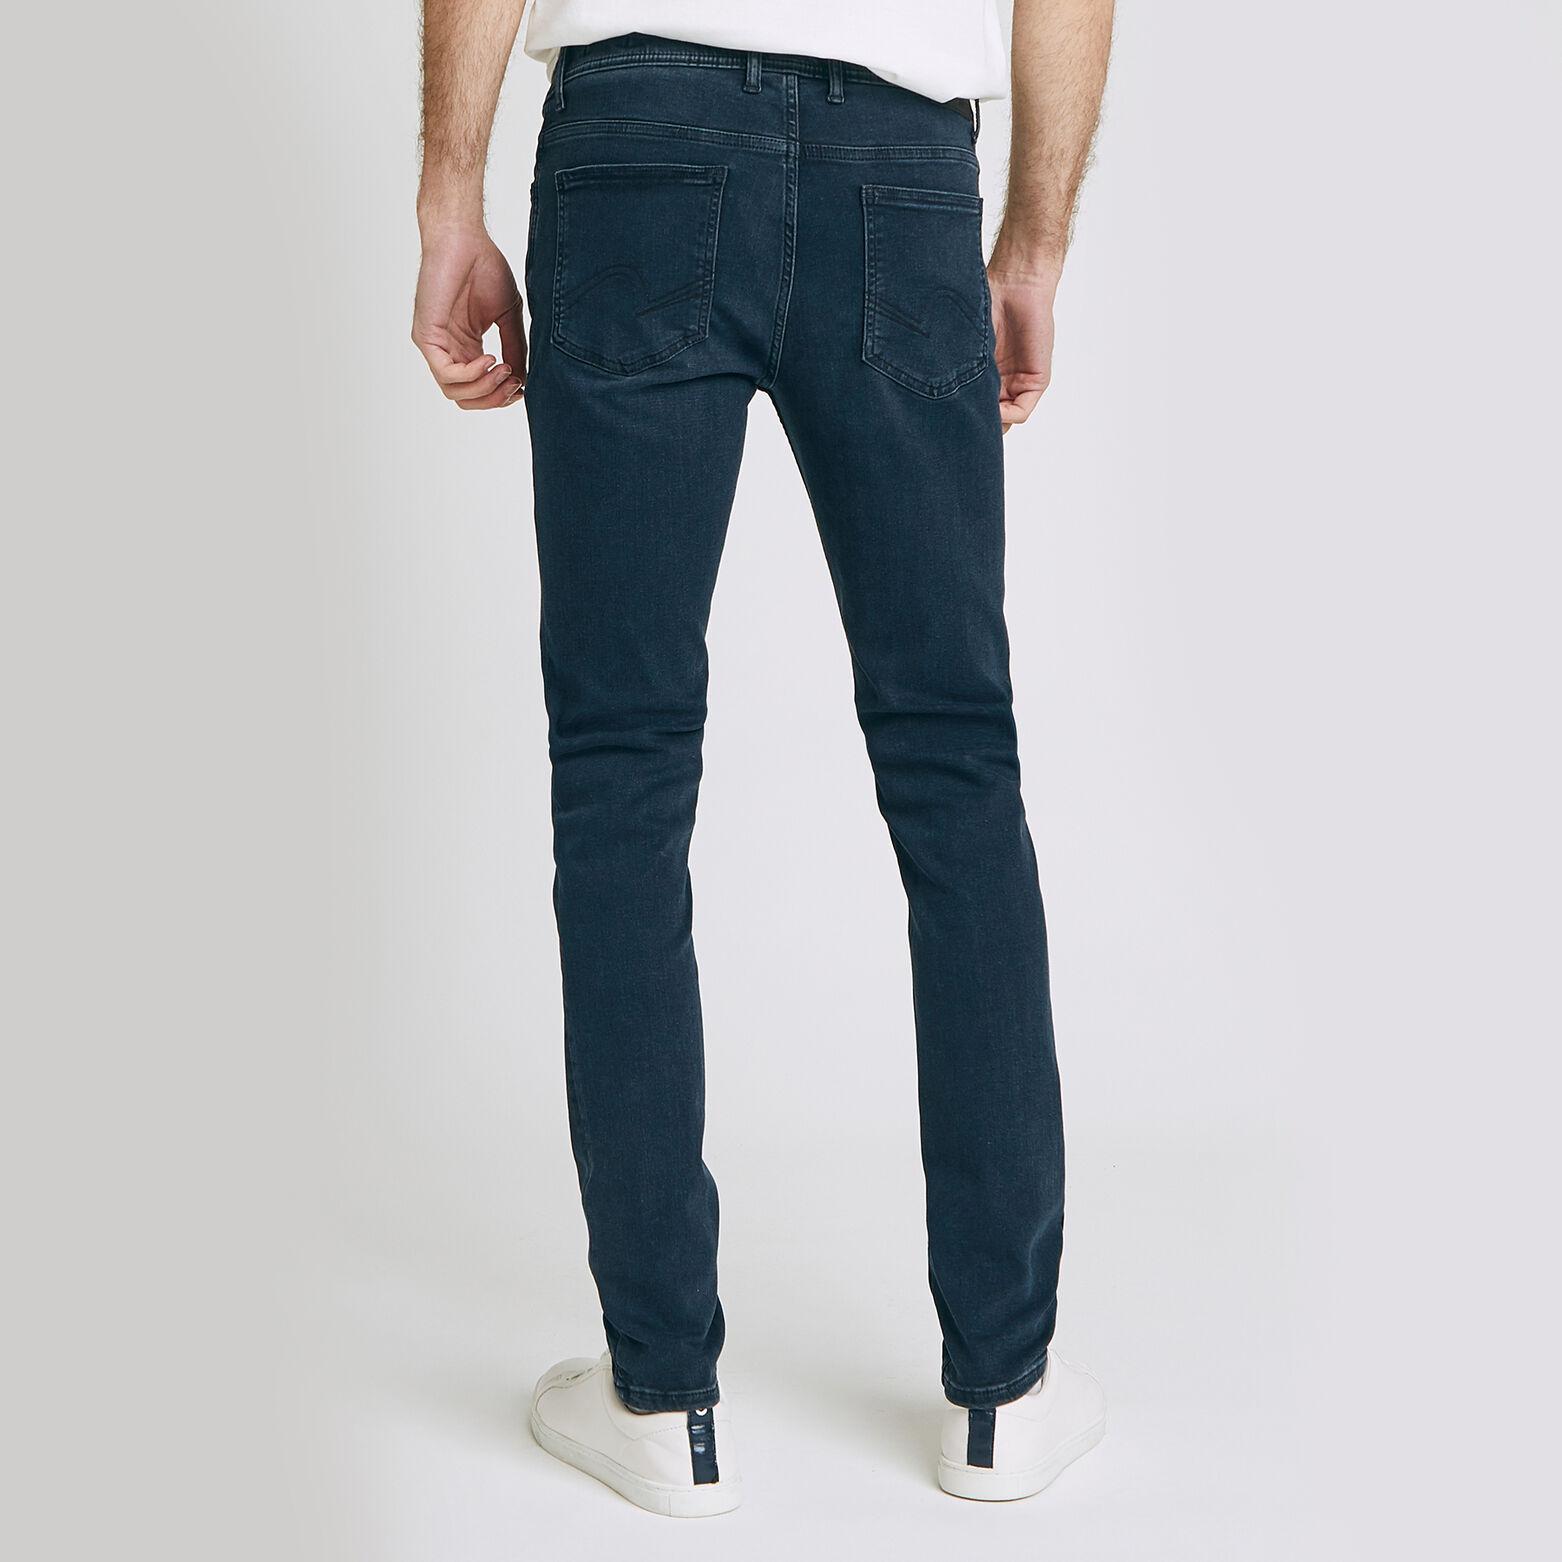 Jean slim #Tom urbanflex blue black